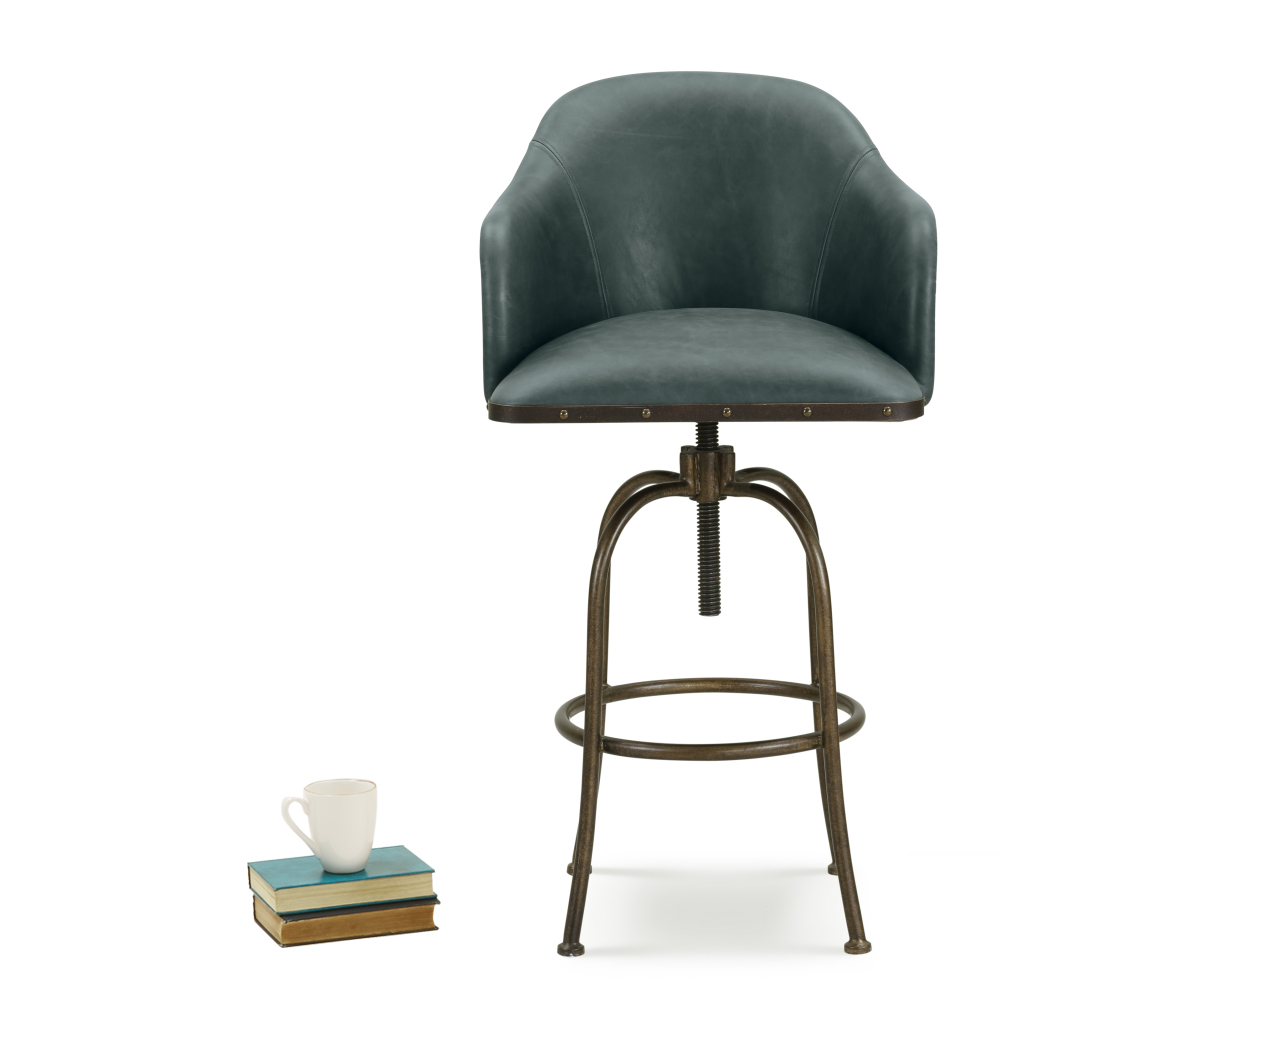 Astounding Milk Kitchen Stool Cjindustries Chair Design For Home Cjindustriesco